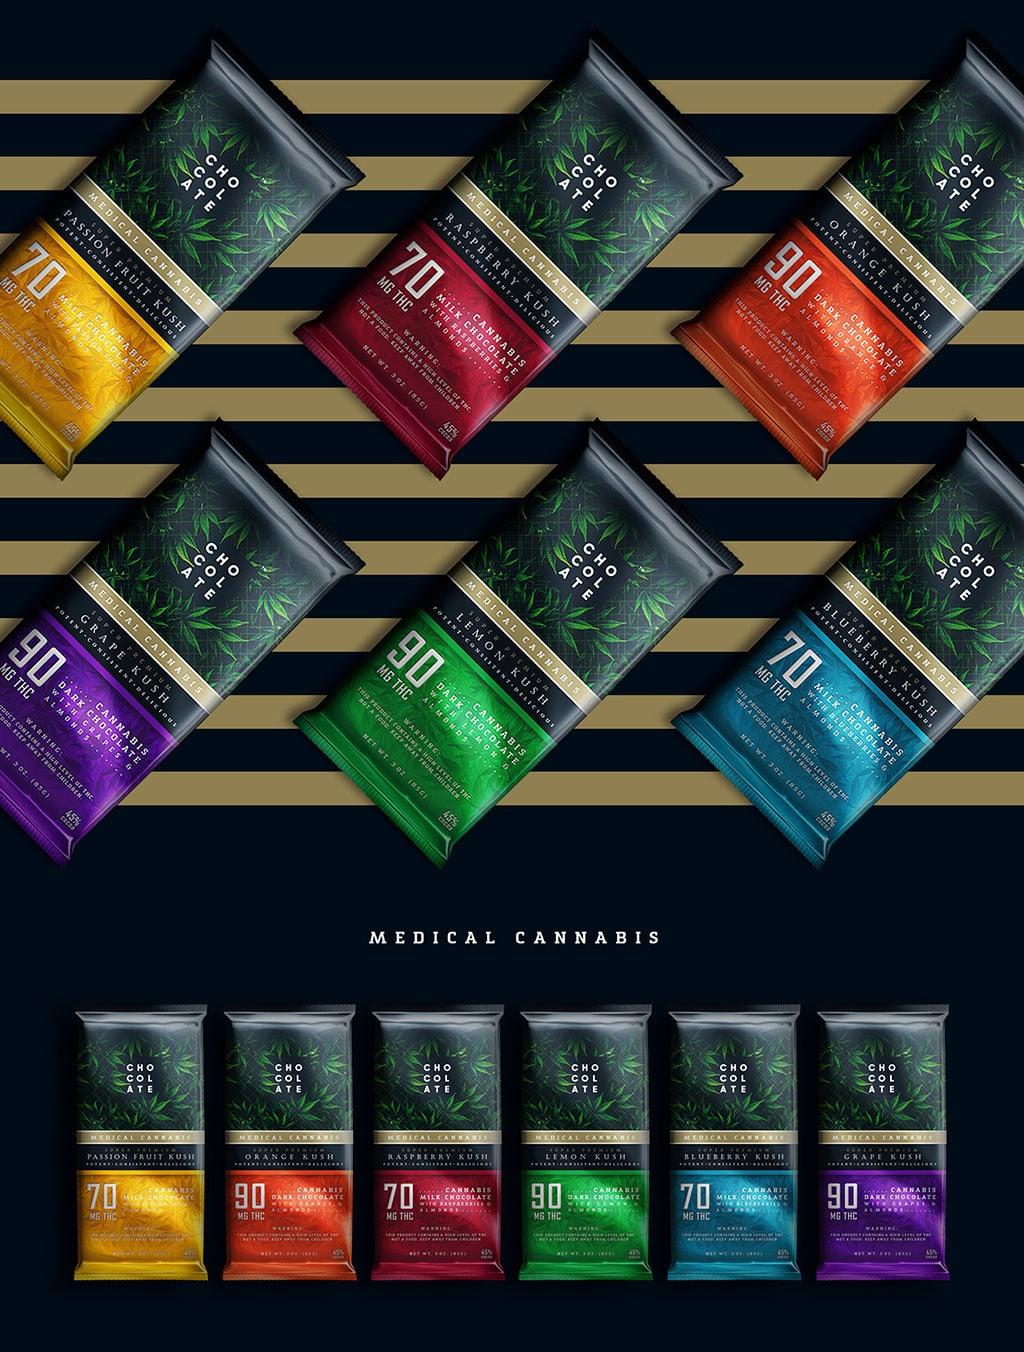 Inspirasi Desain Kemasan Packaging - MedicalCannabis Chocolate